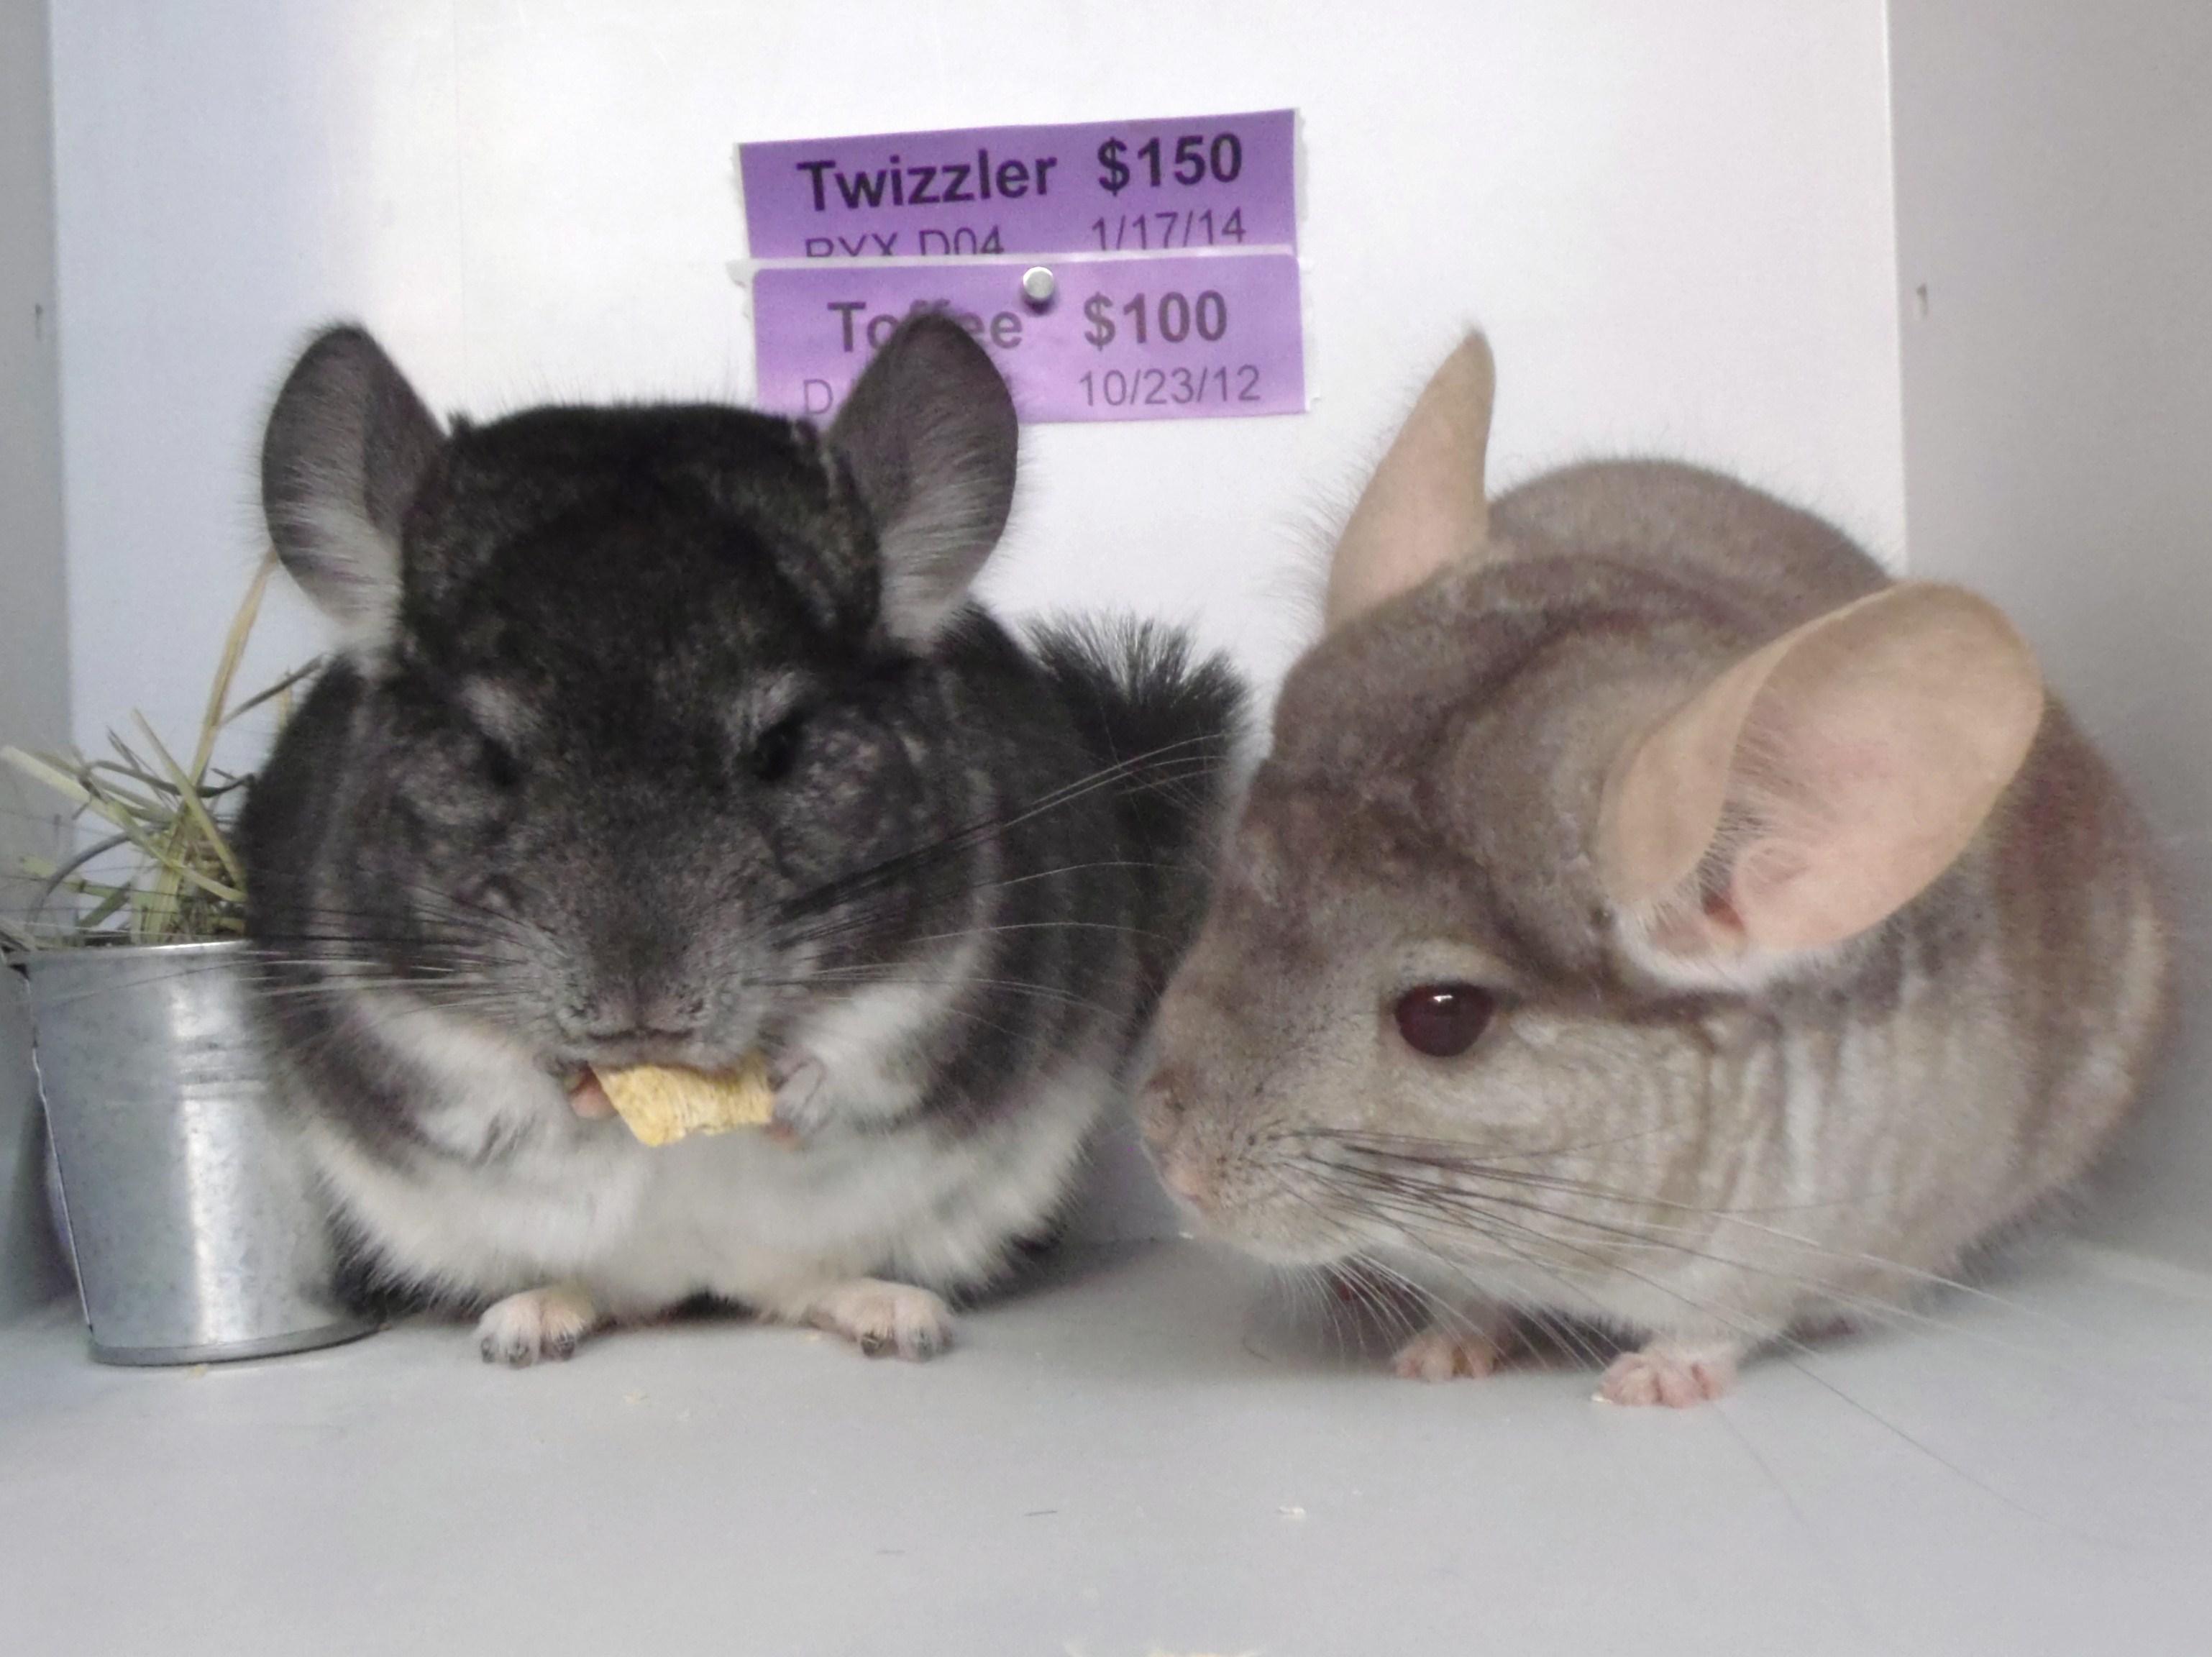 Twizzler & Toffee